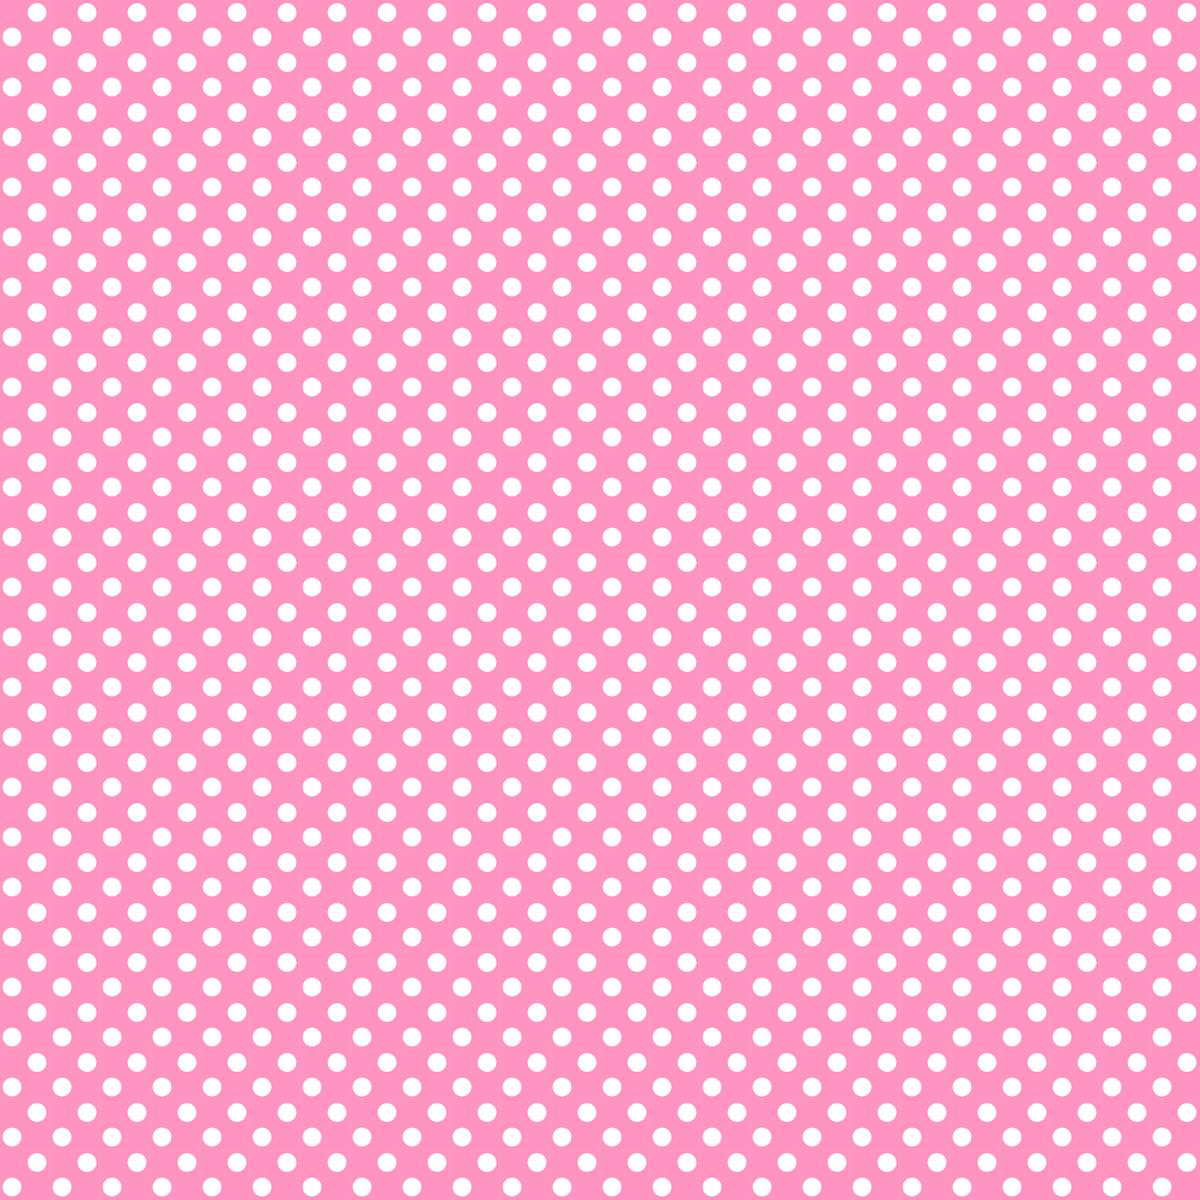 free digital polka dot scrapbooking papers   Pnktchenpapier 1200x1200